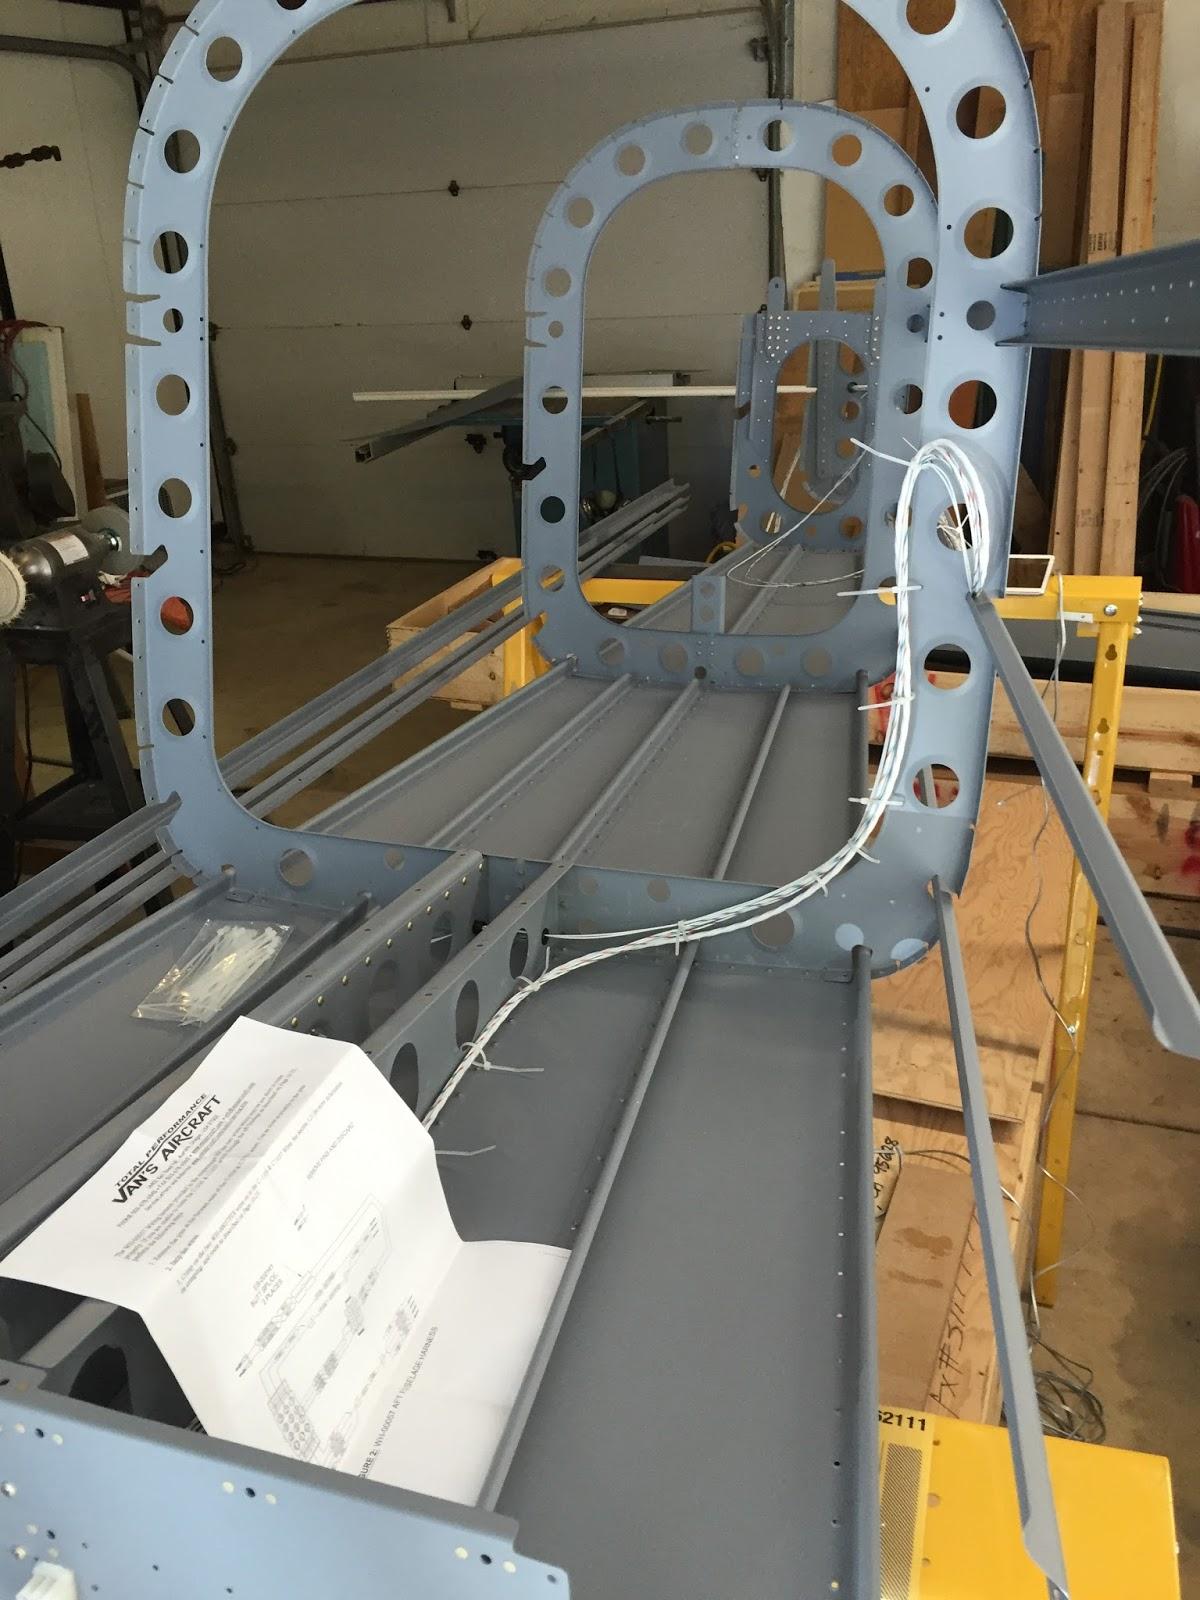 wiring harness skins wiring diagram dom truck wiring harness wiring harness skins [ 1200 x 1600 Pixel ]